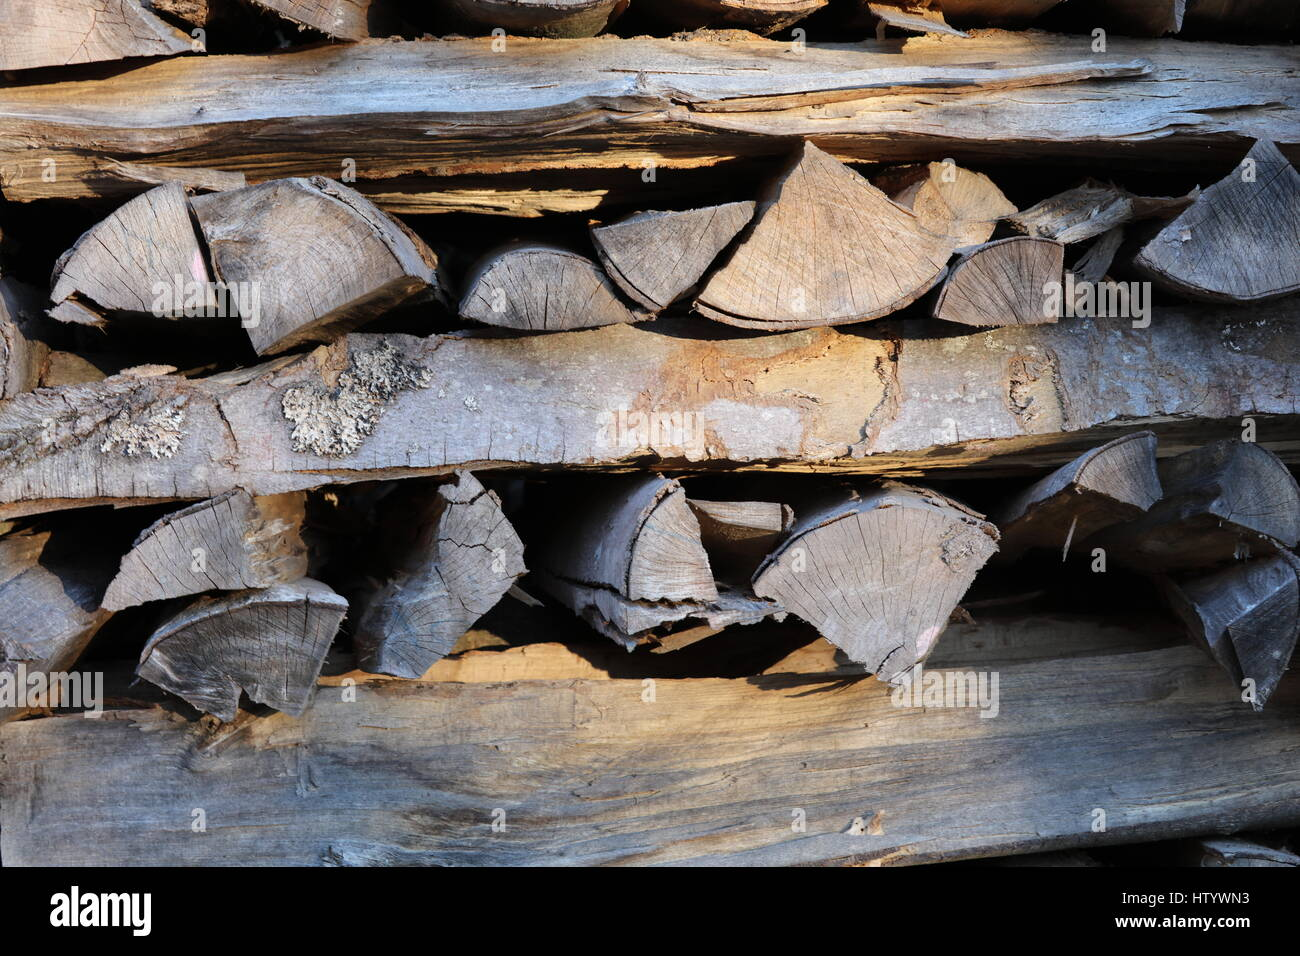 Brennholz Kaminholz aufgestapelt Foto Stock